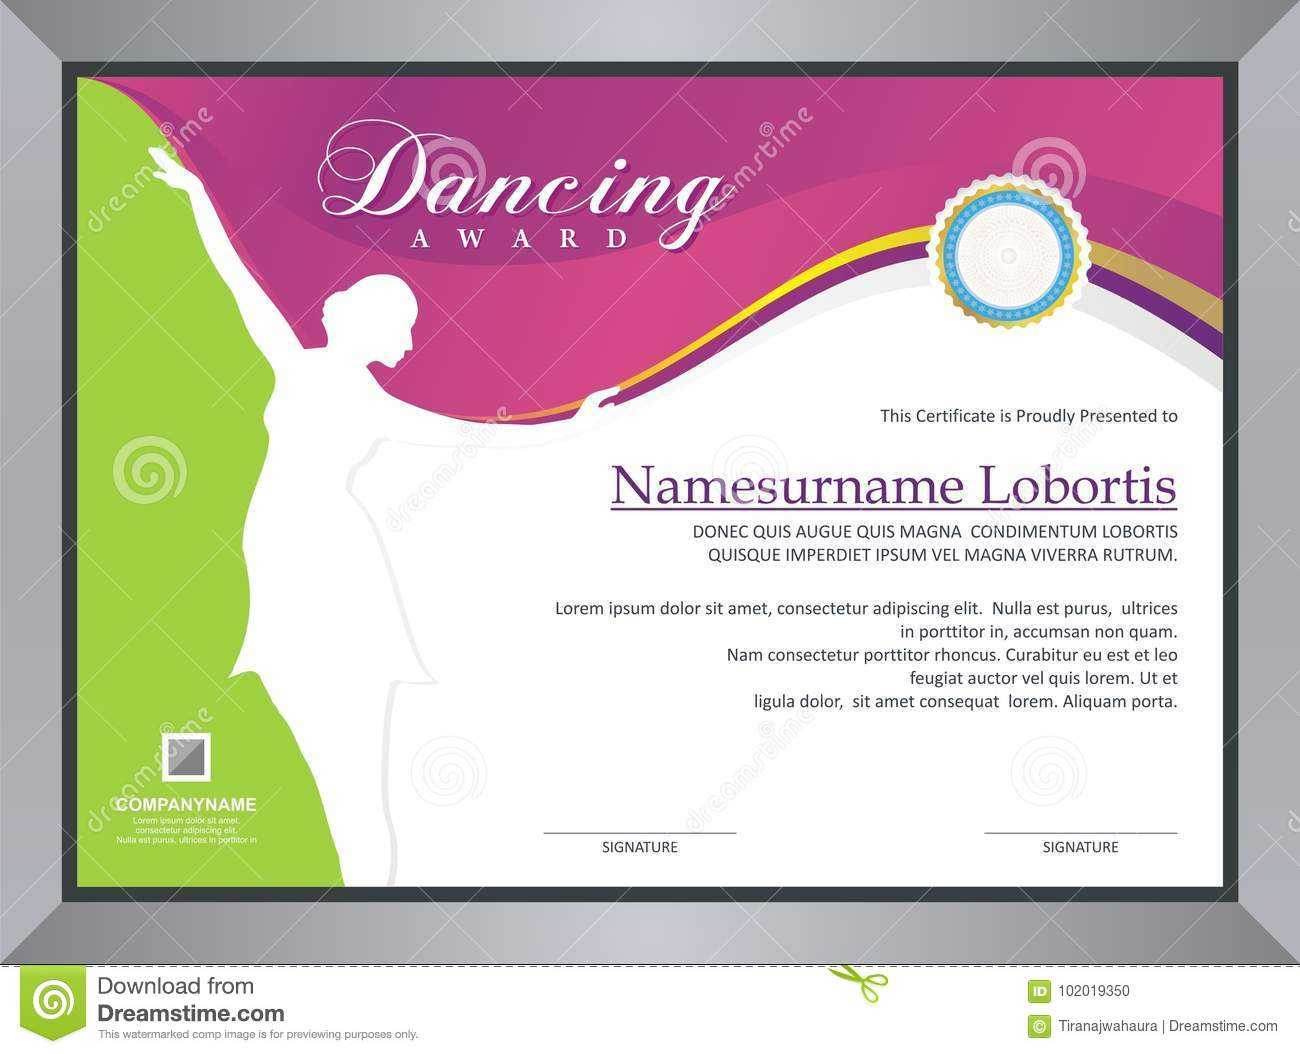 Dancing Award Stock Vector. Illustration Of Certificate For Dance Certificate Template